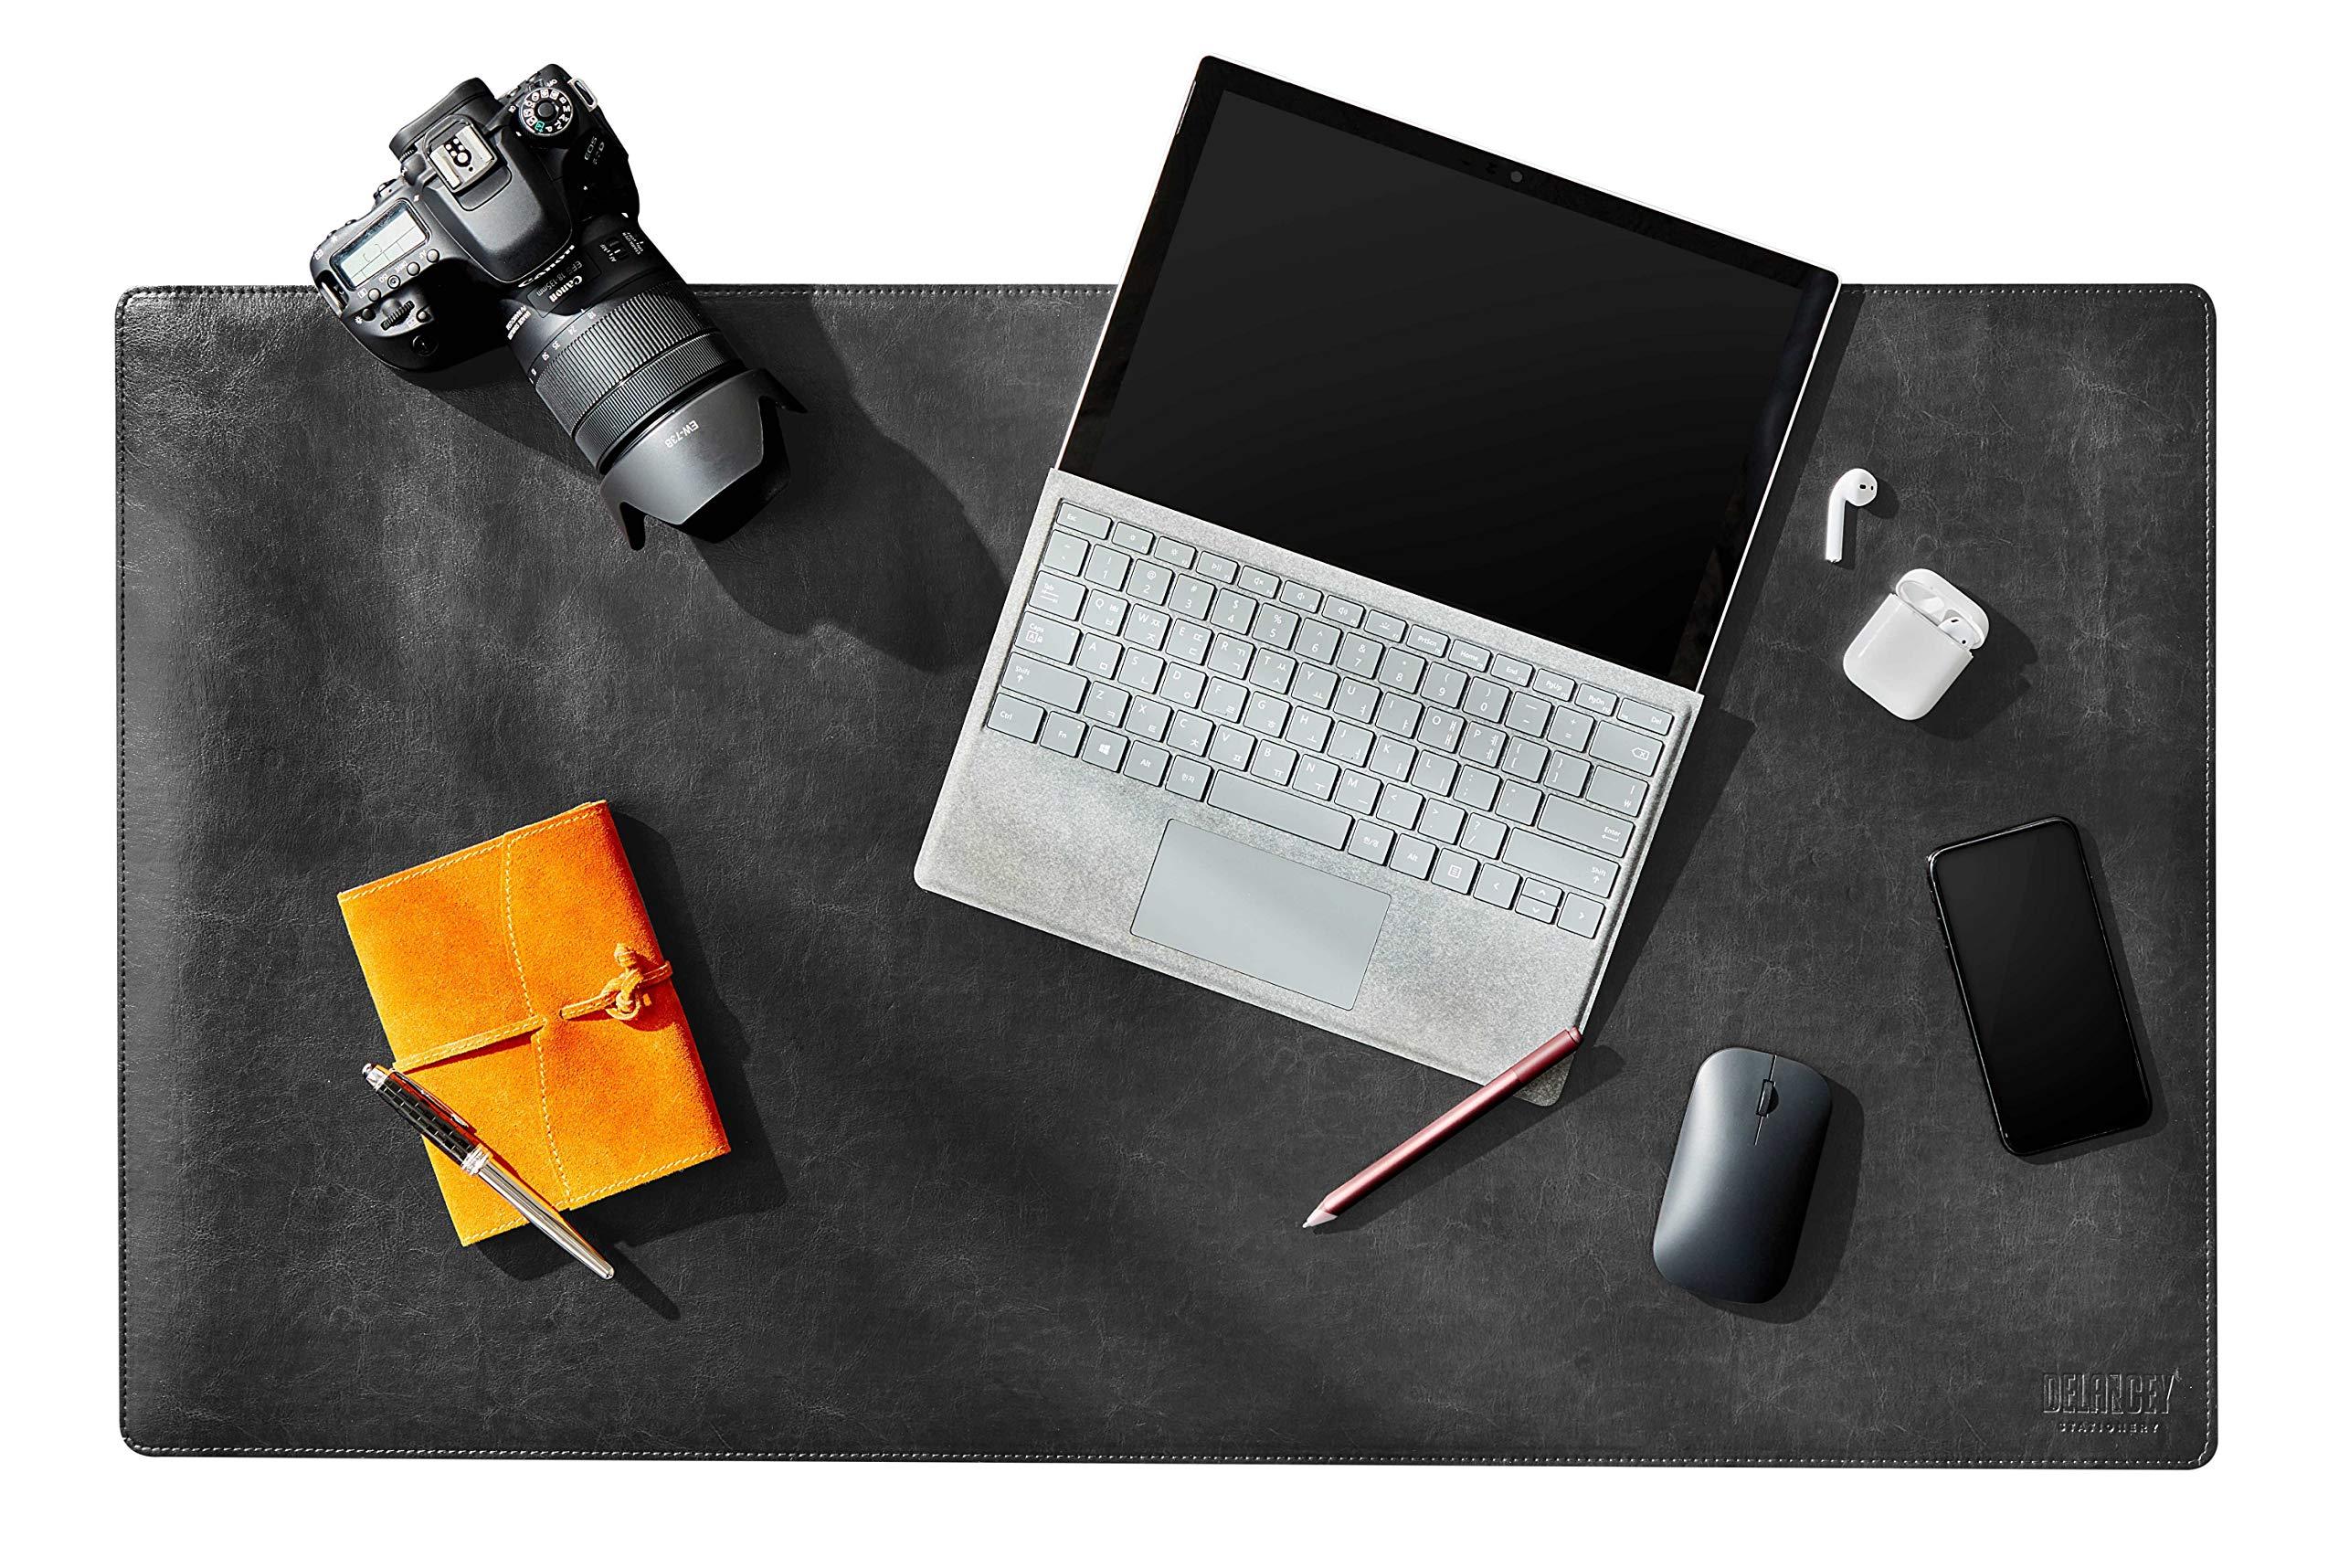 Delancey USA 36 x 20 Inches Black Office Desk Pad, Leather Desk Blotter Pad, Desk Mat Protector